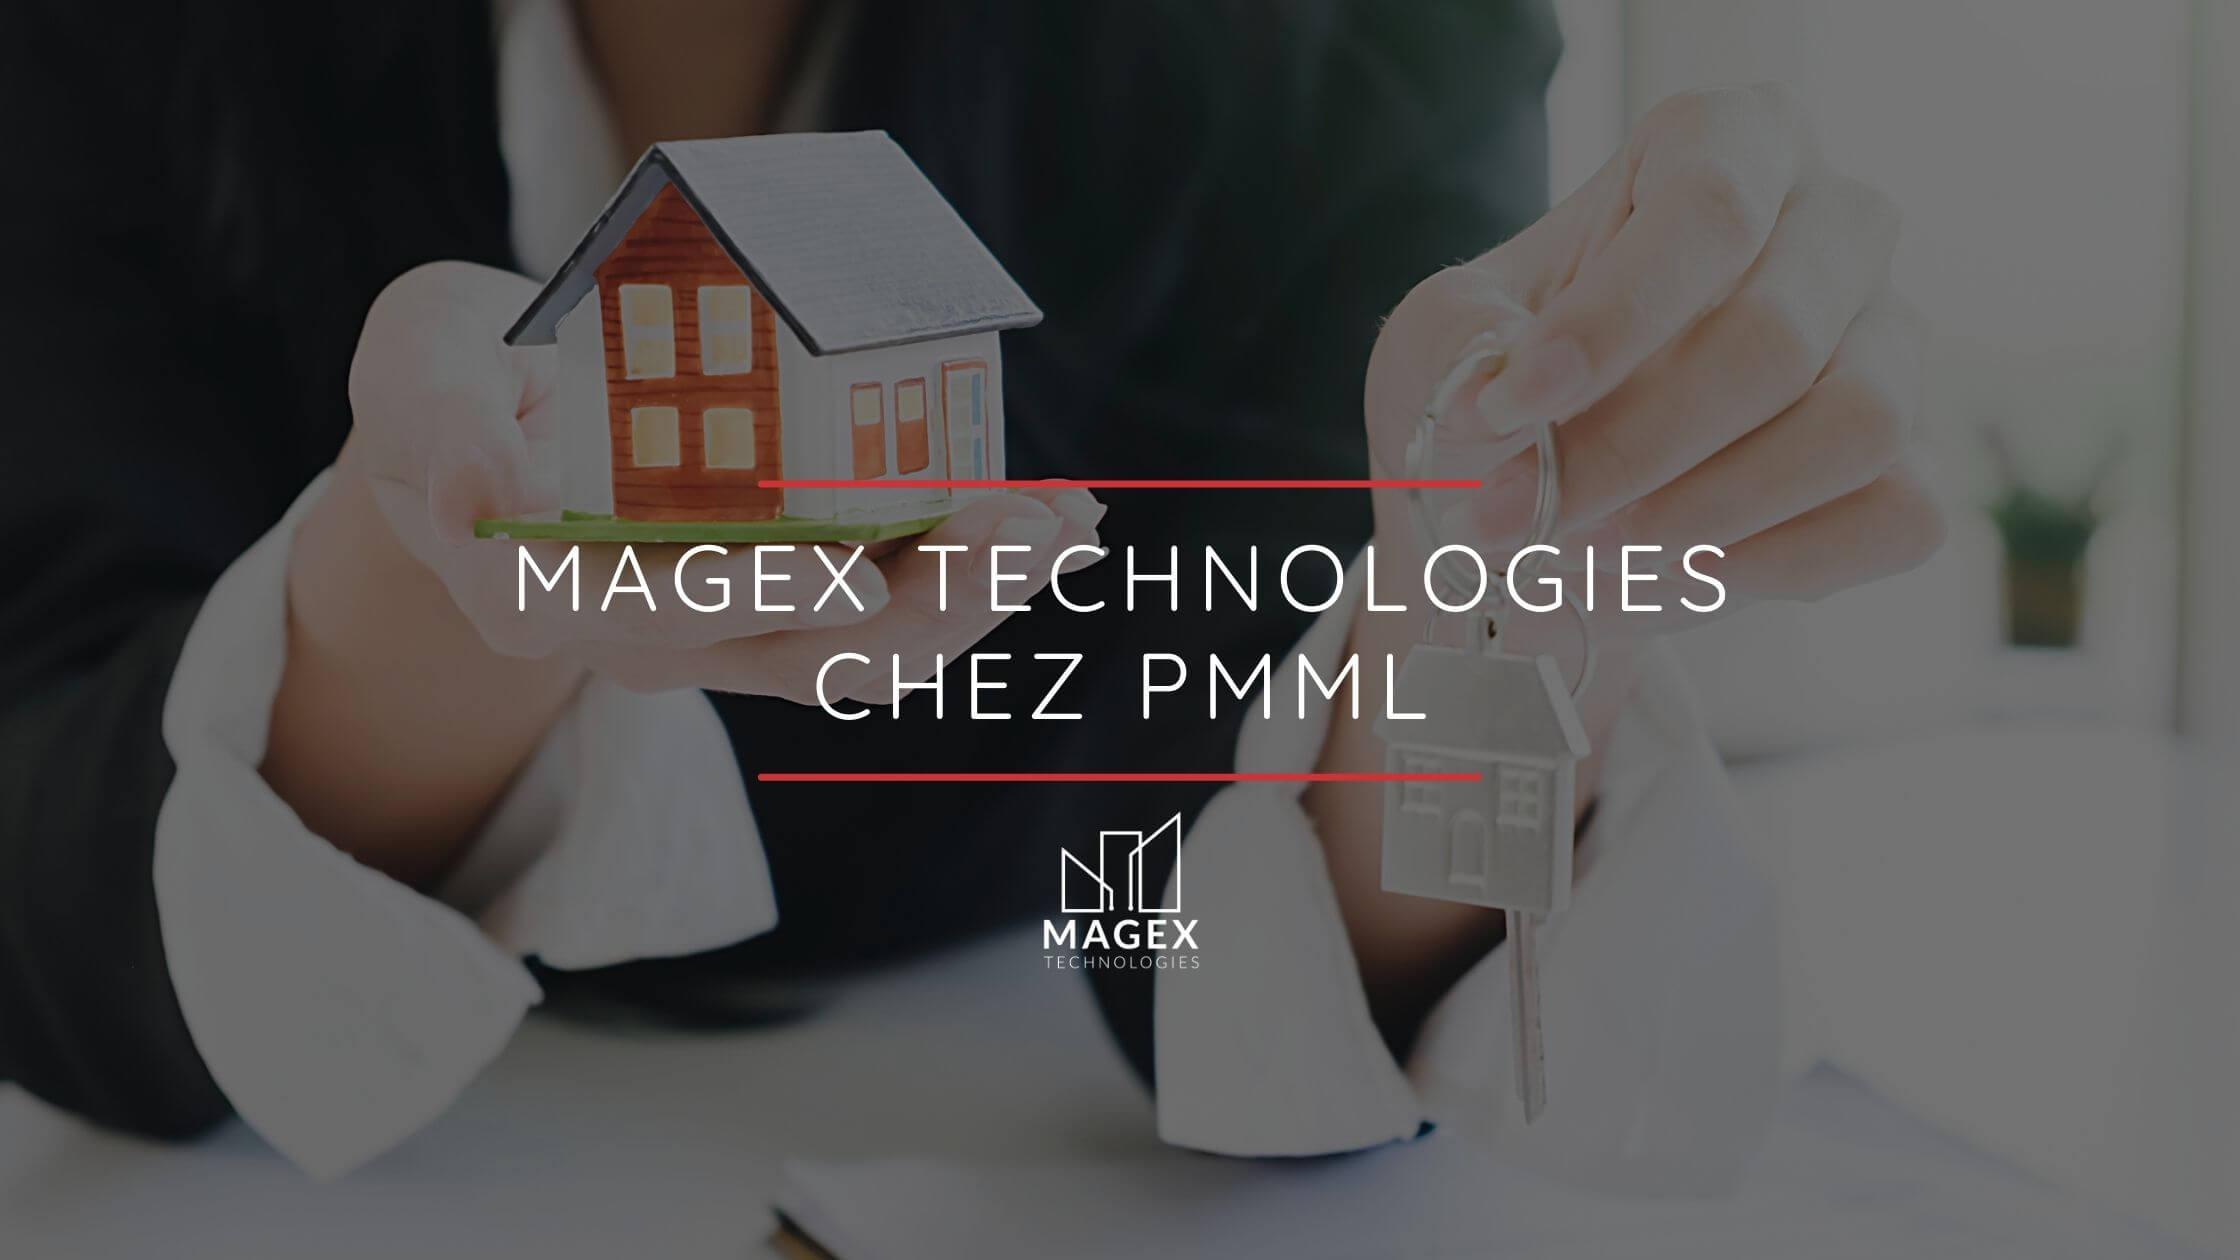 Magex Technologies chez PMML